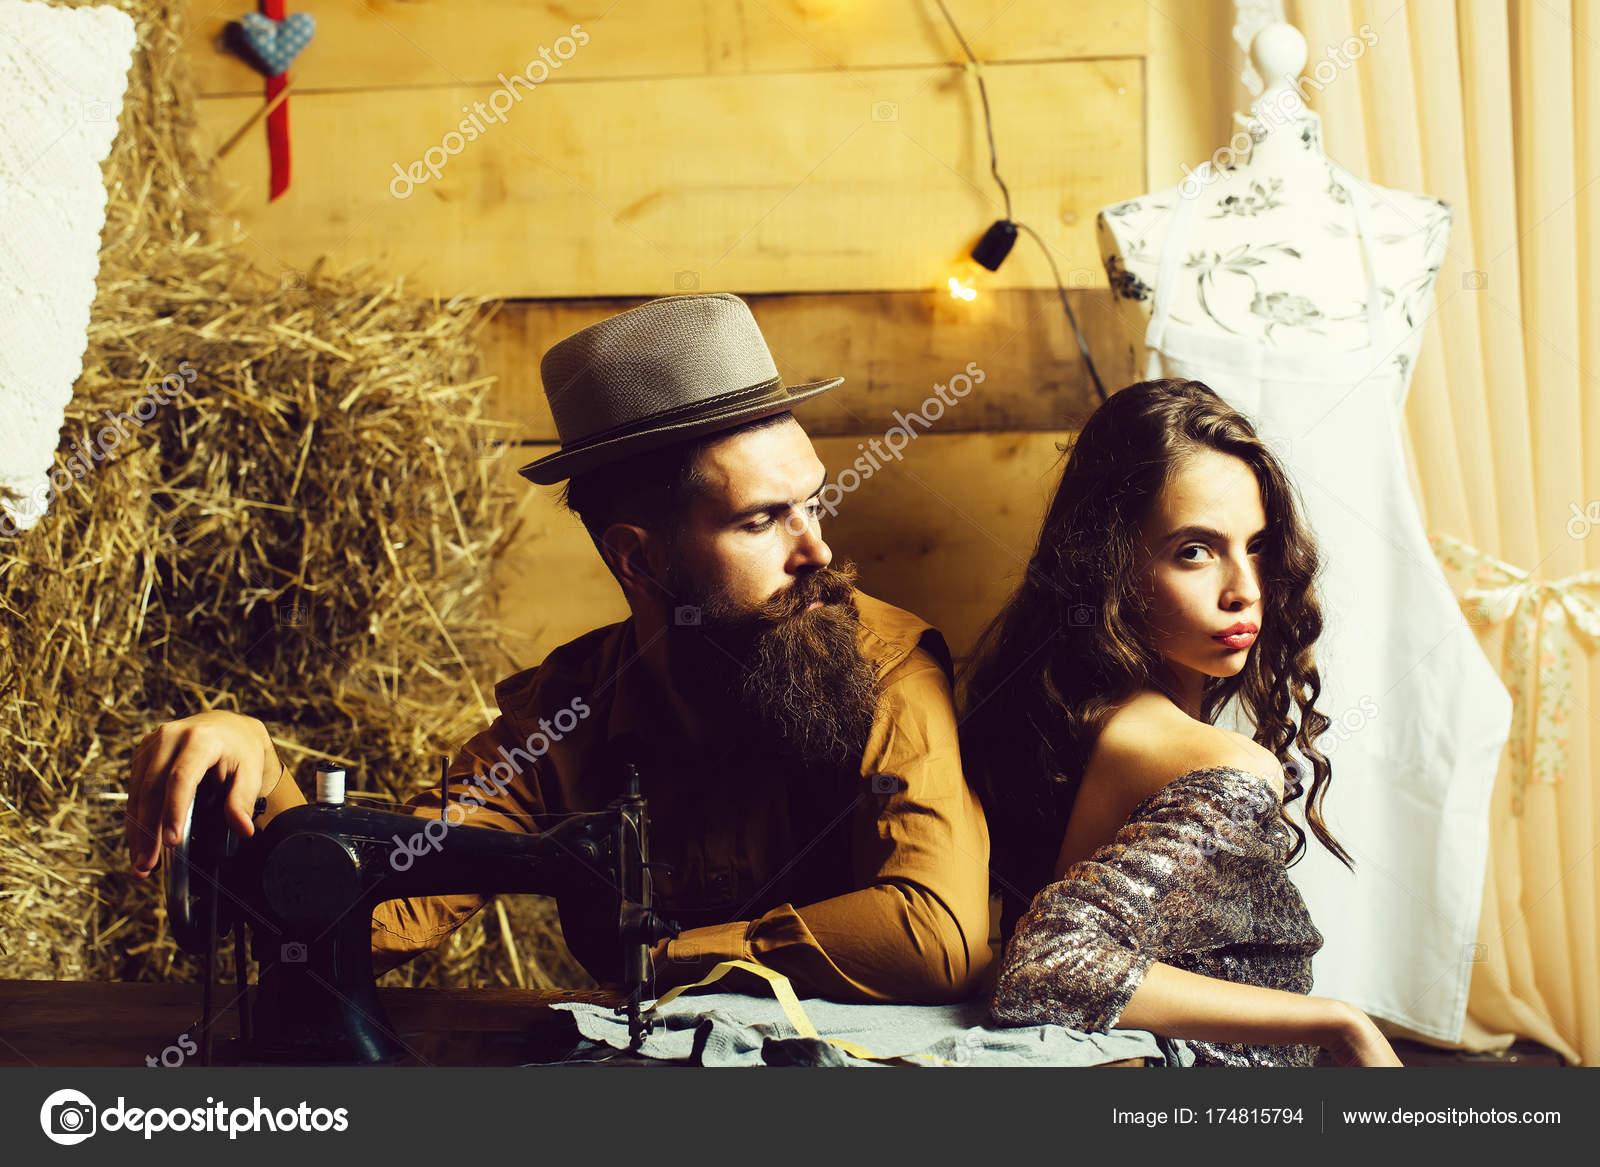 depositphotos_174815794-stock-photo-tailor-man-and-pretty-girl